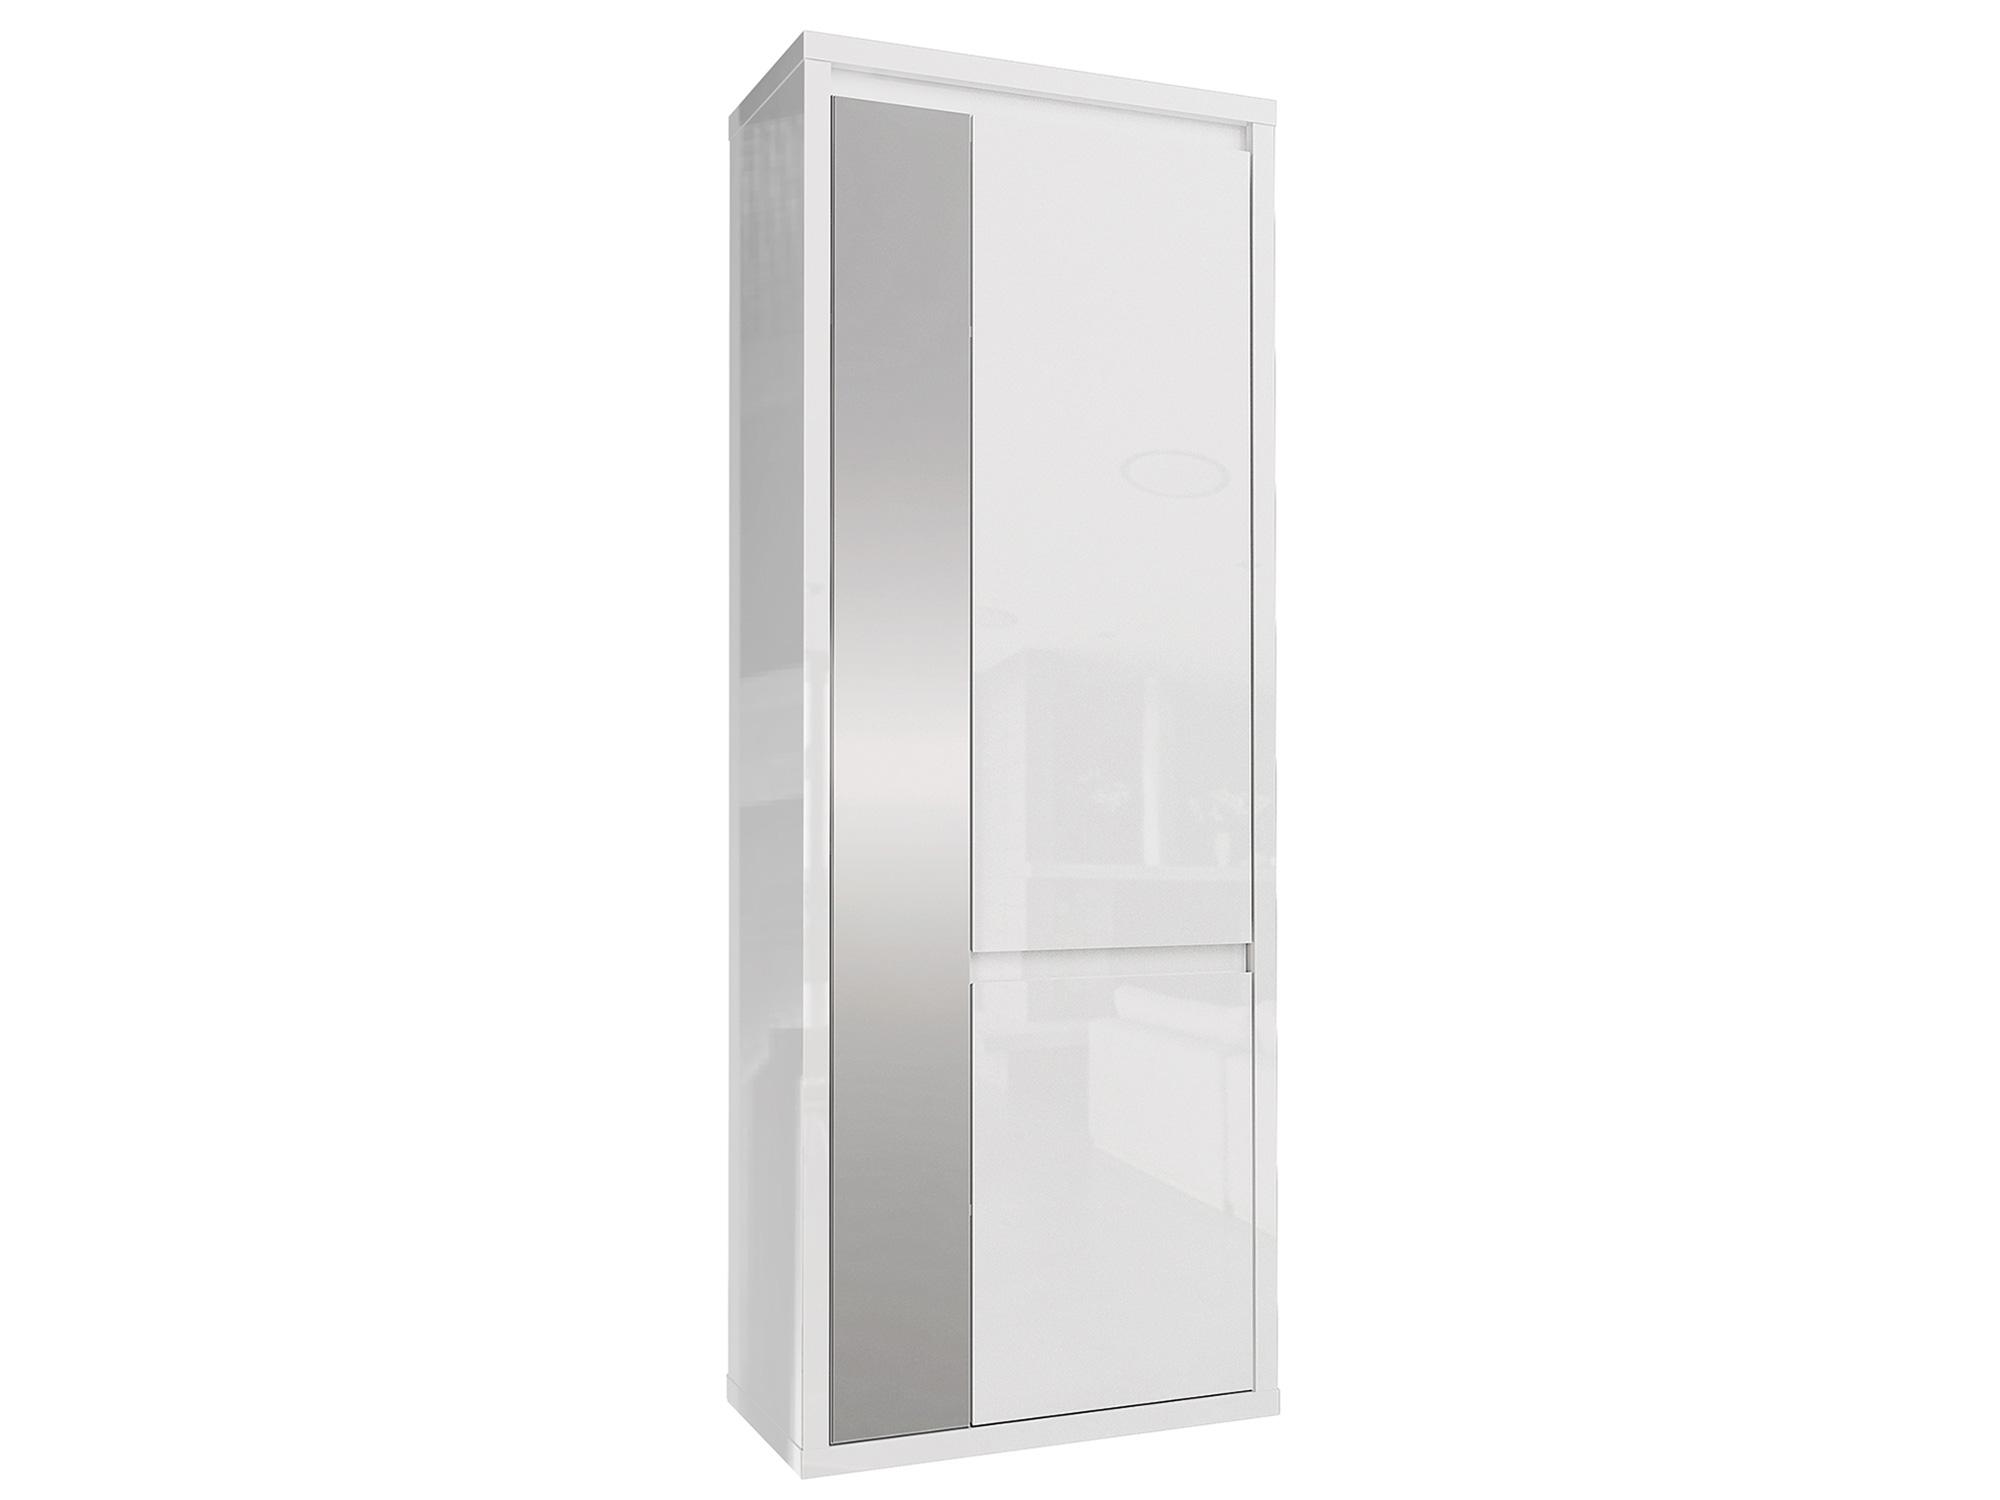 Шкаф 2-х дверный Норден Белый глянец, , Белый, ЛДСП, Зеркало Белый, Белый глянец